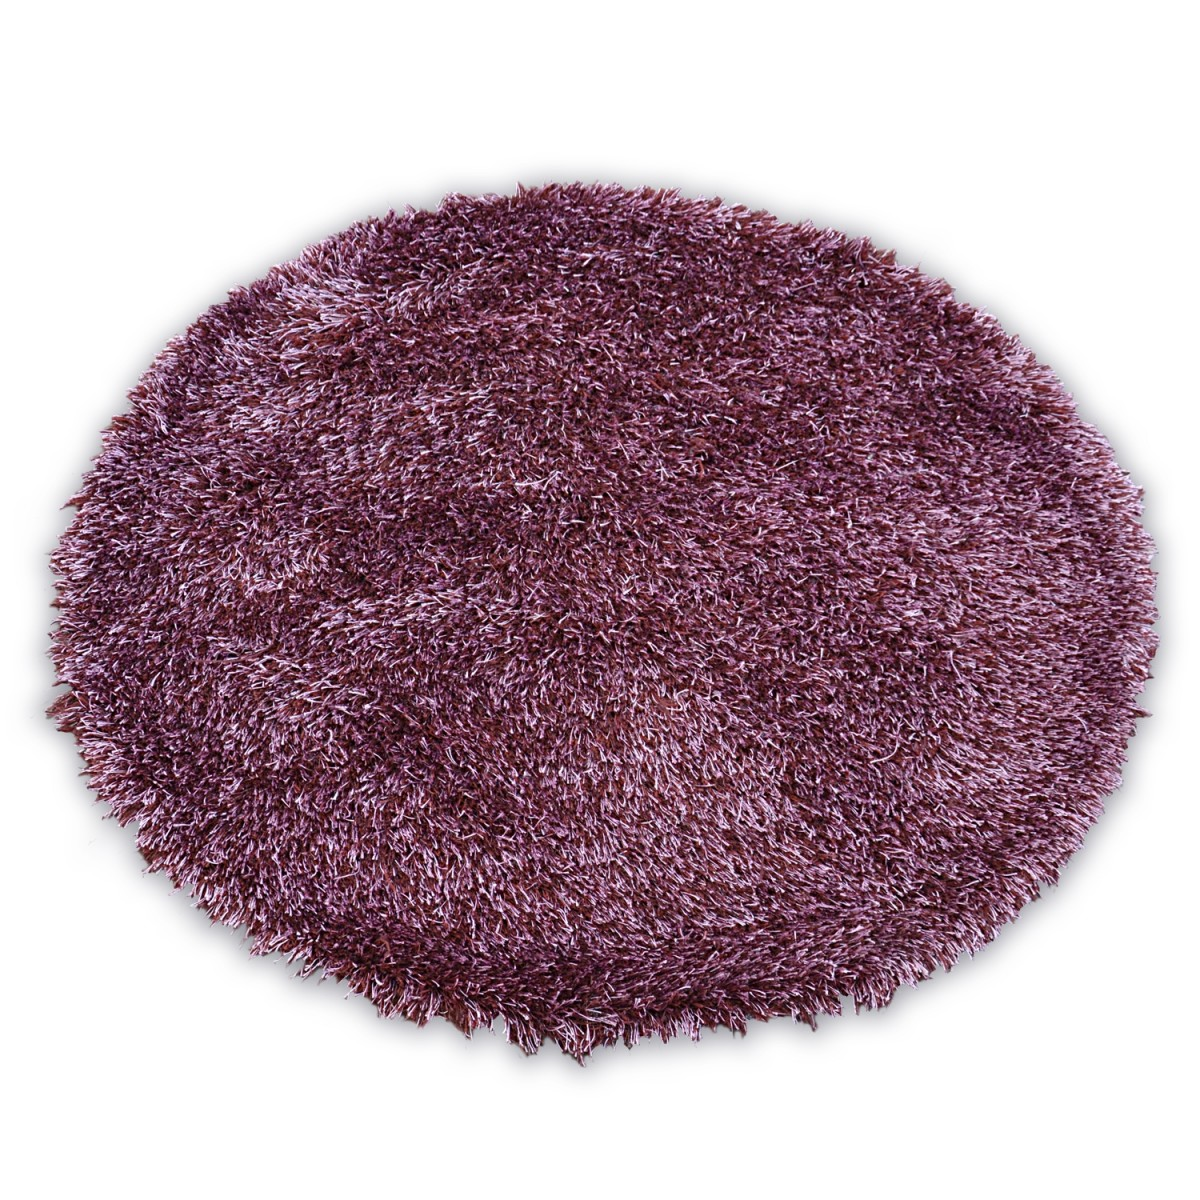 3kraft Kulatý koberec LOVE SHAGGY fialový